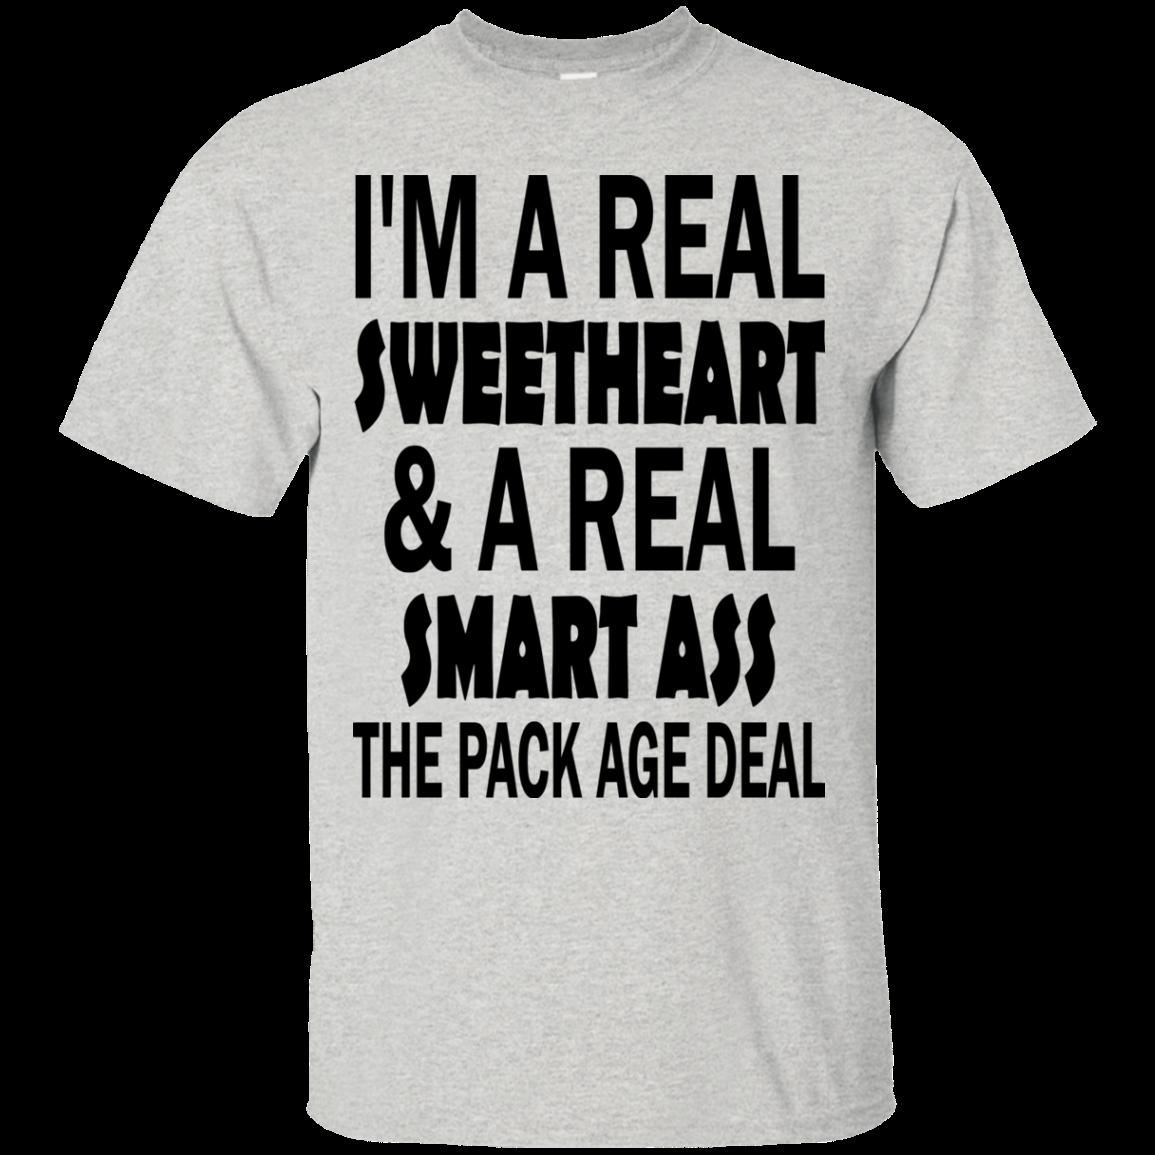 I m a real. Clipart shirt hawaiian outfit